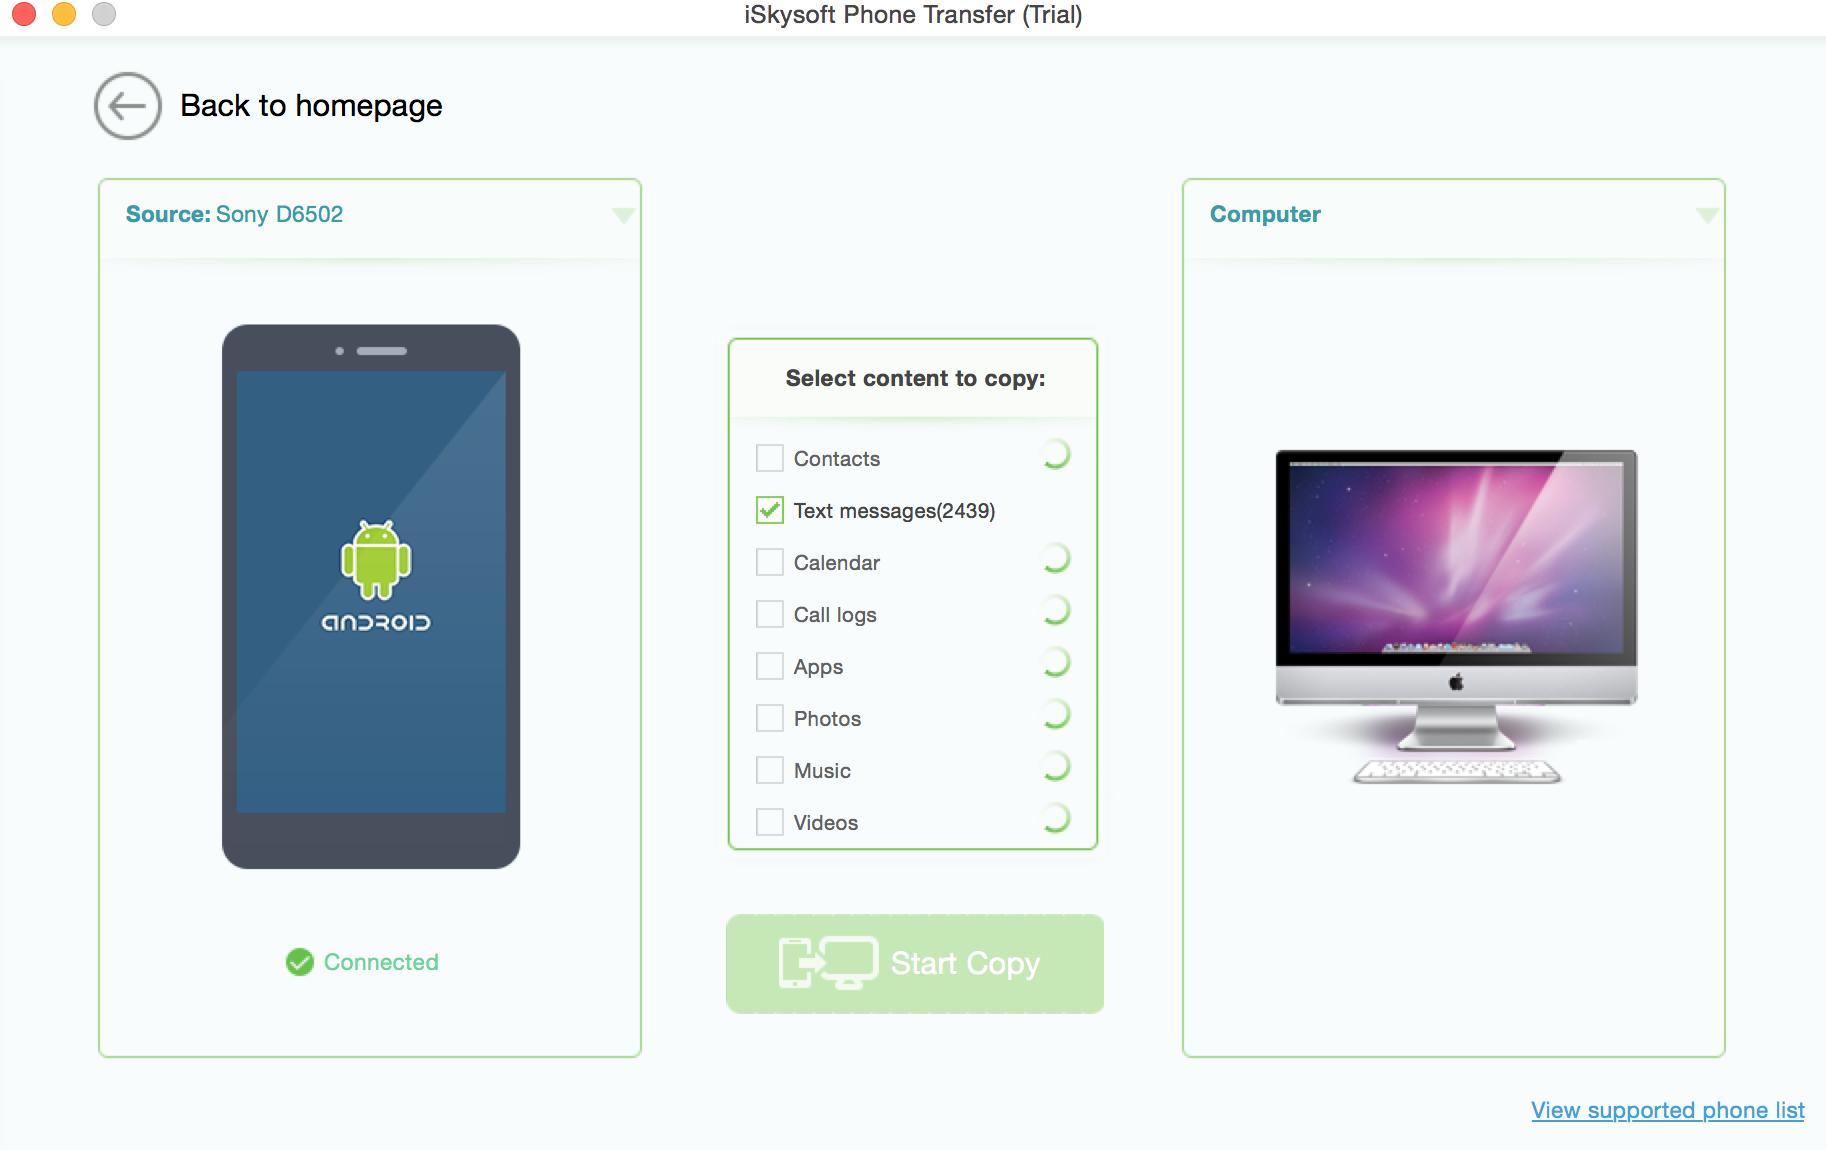 download iskysoft phone transfer